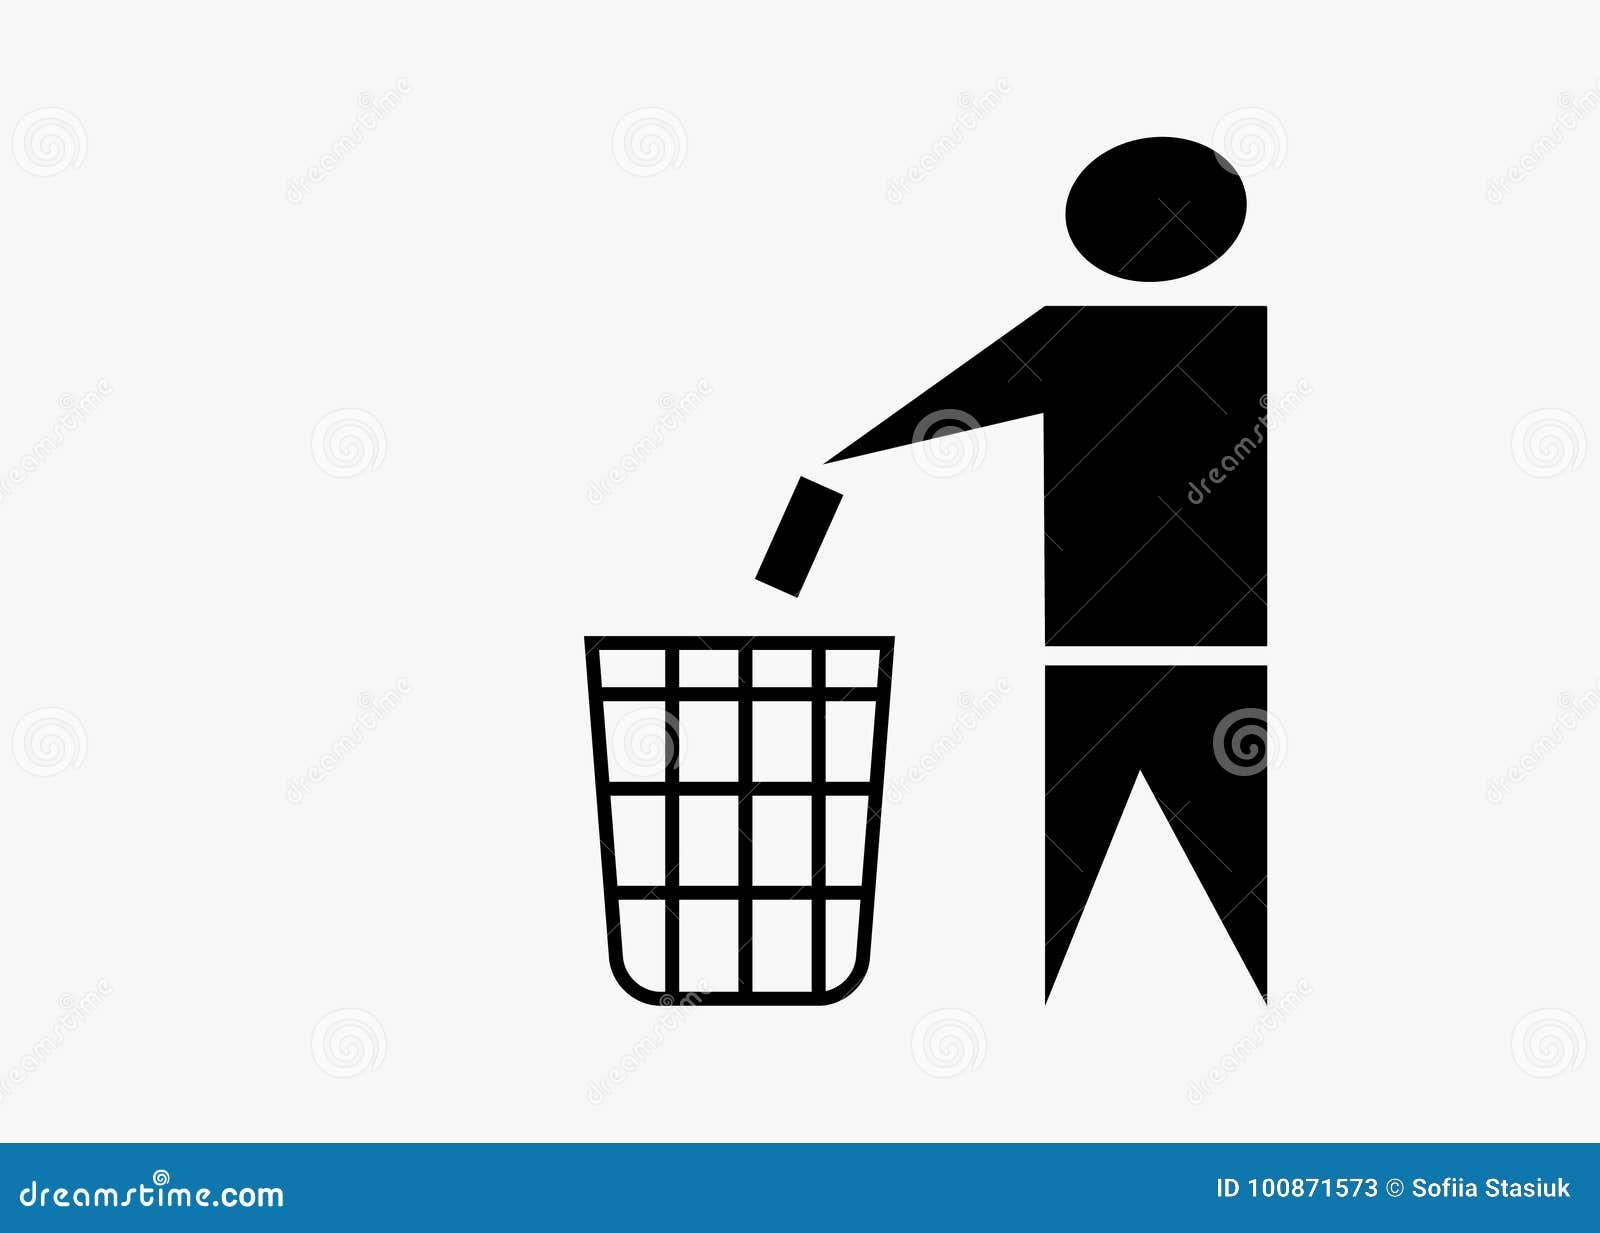 Trash Can Symbol No Littering Stock Vector Illustration Of Hand